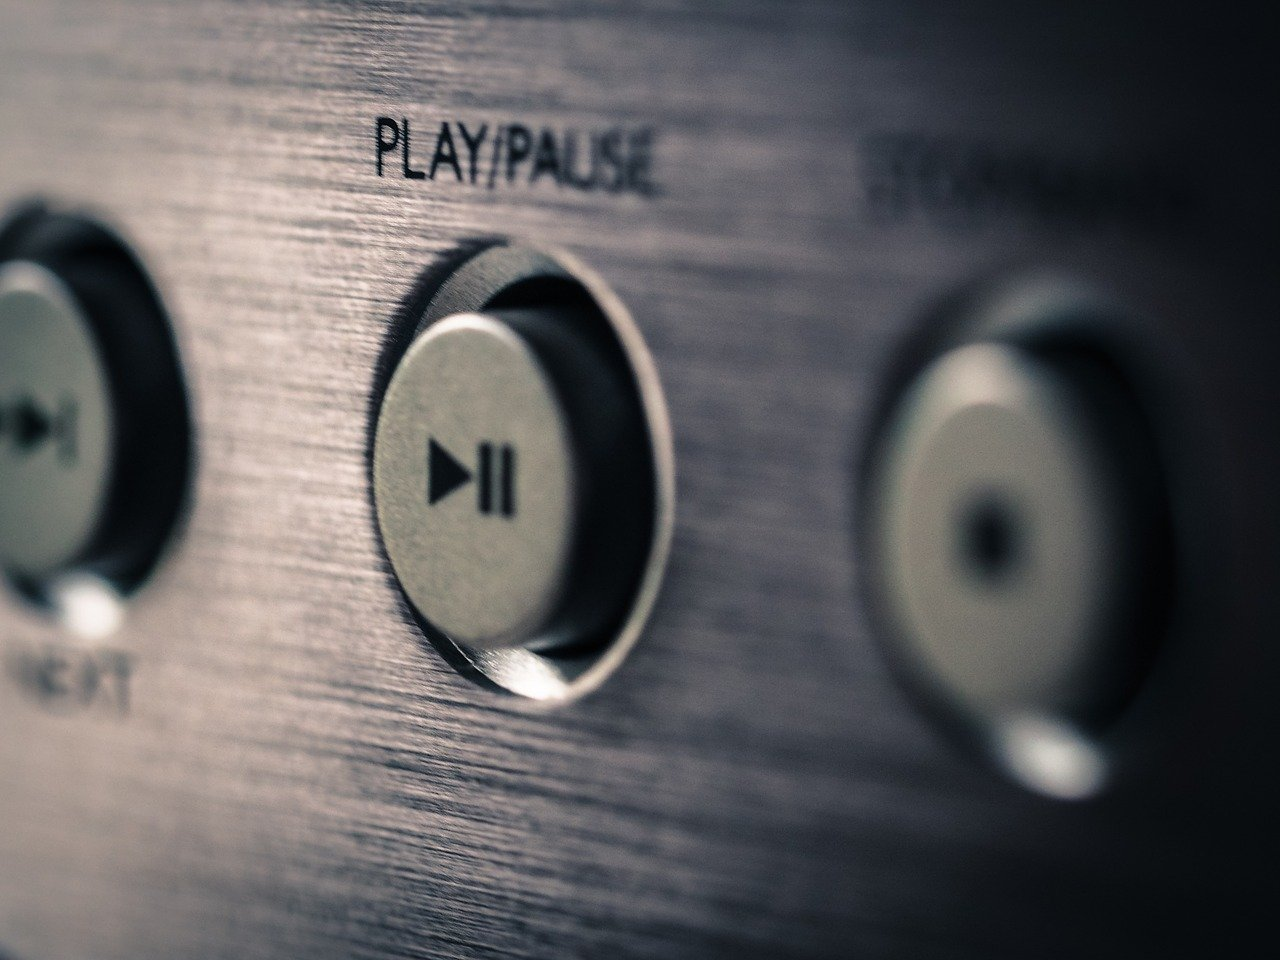 【AviUtl】再生ボタンを表示する方法|便利なショートカットも